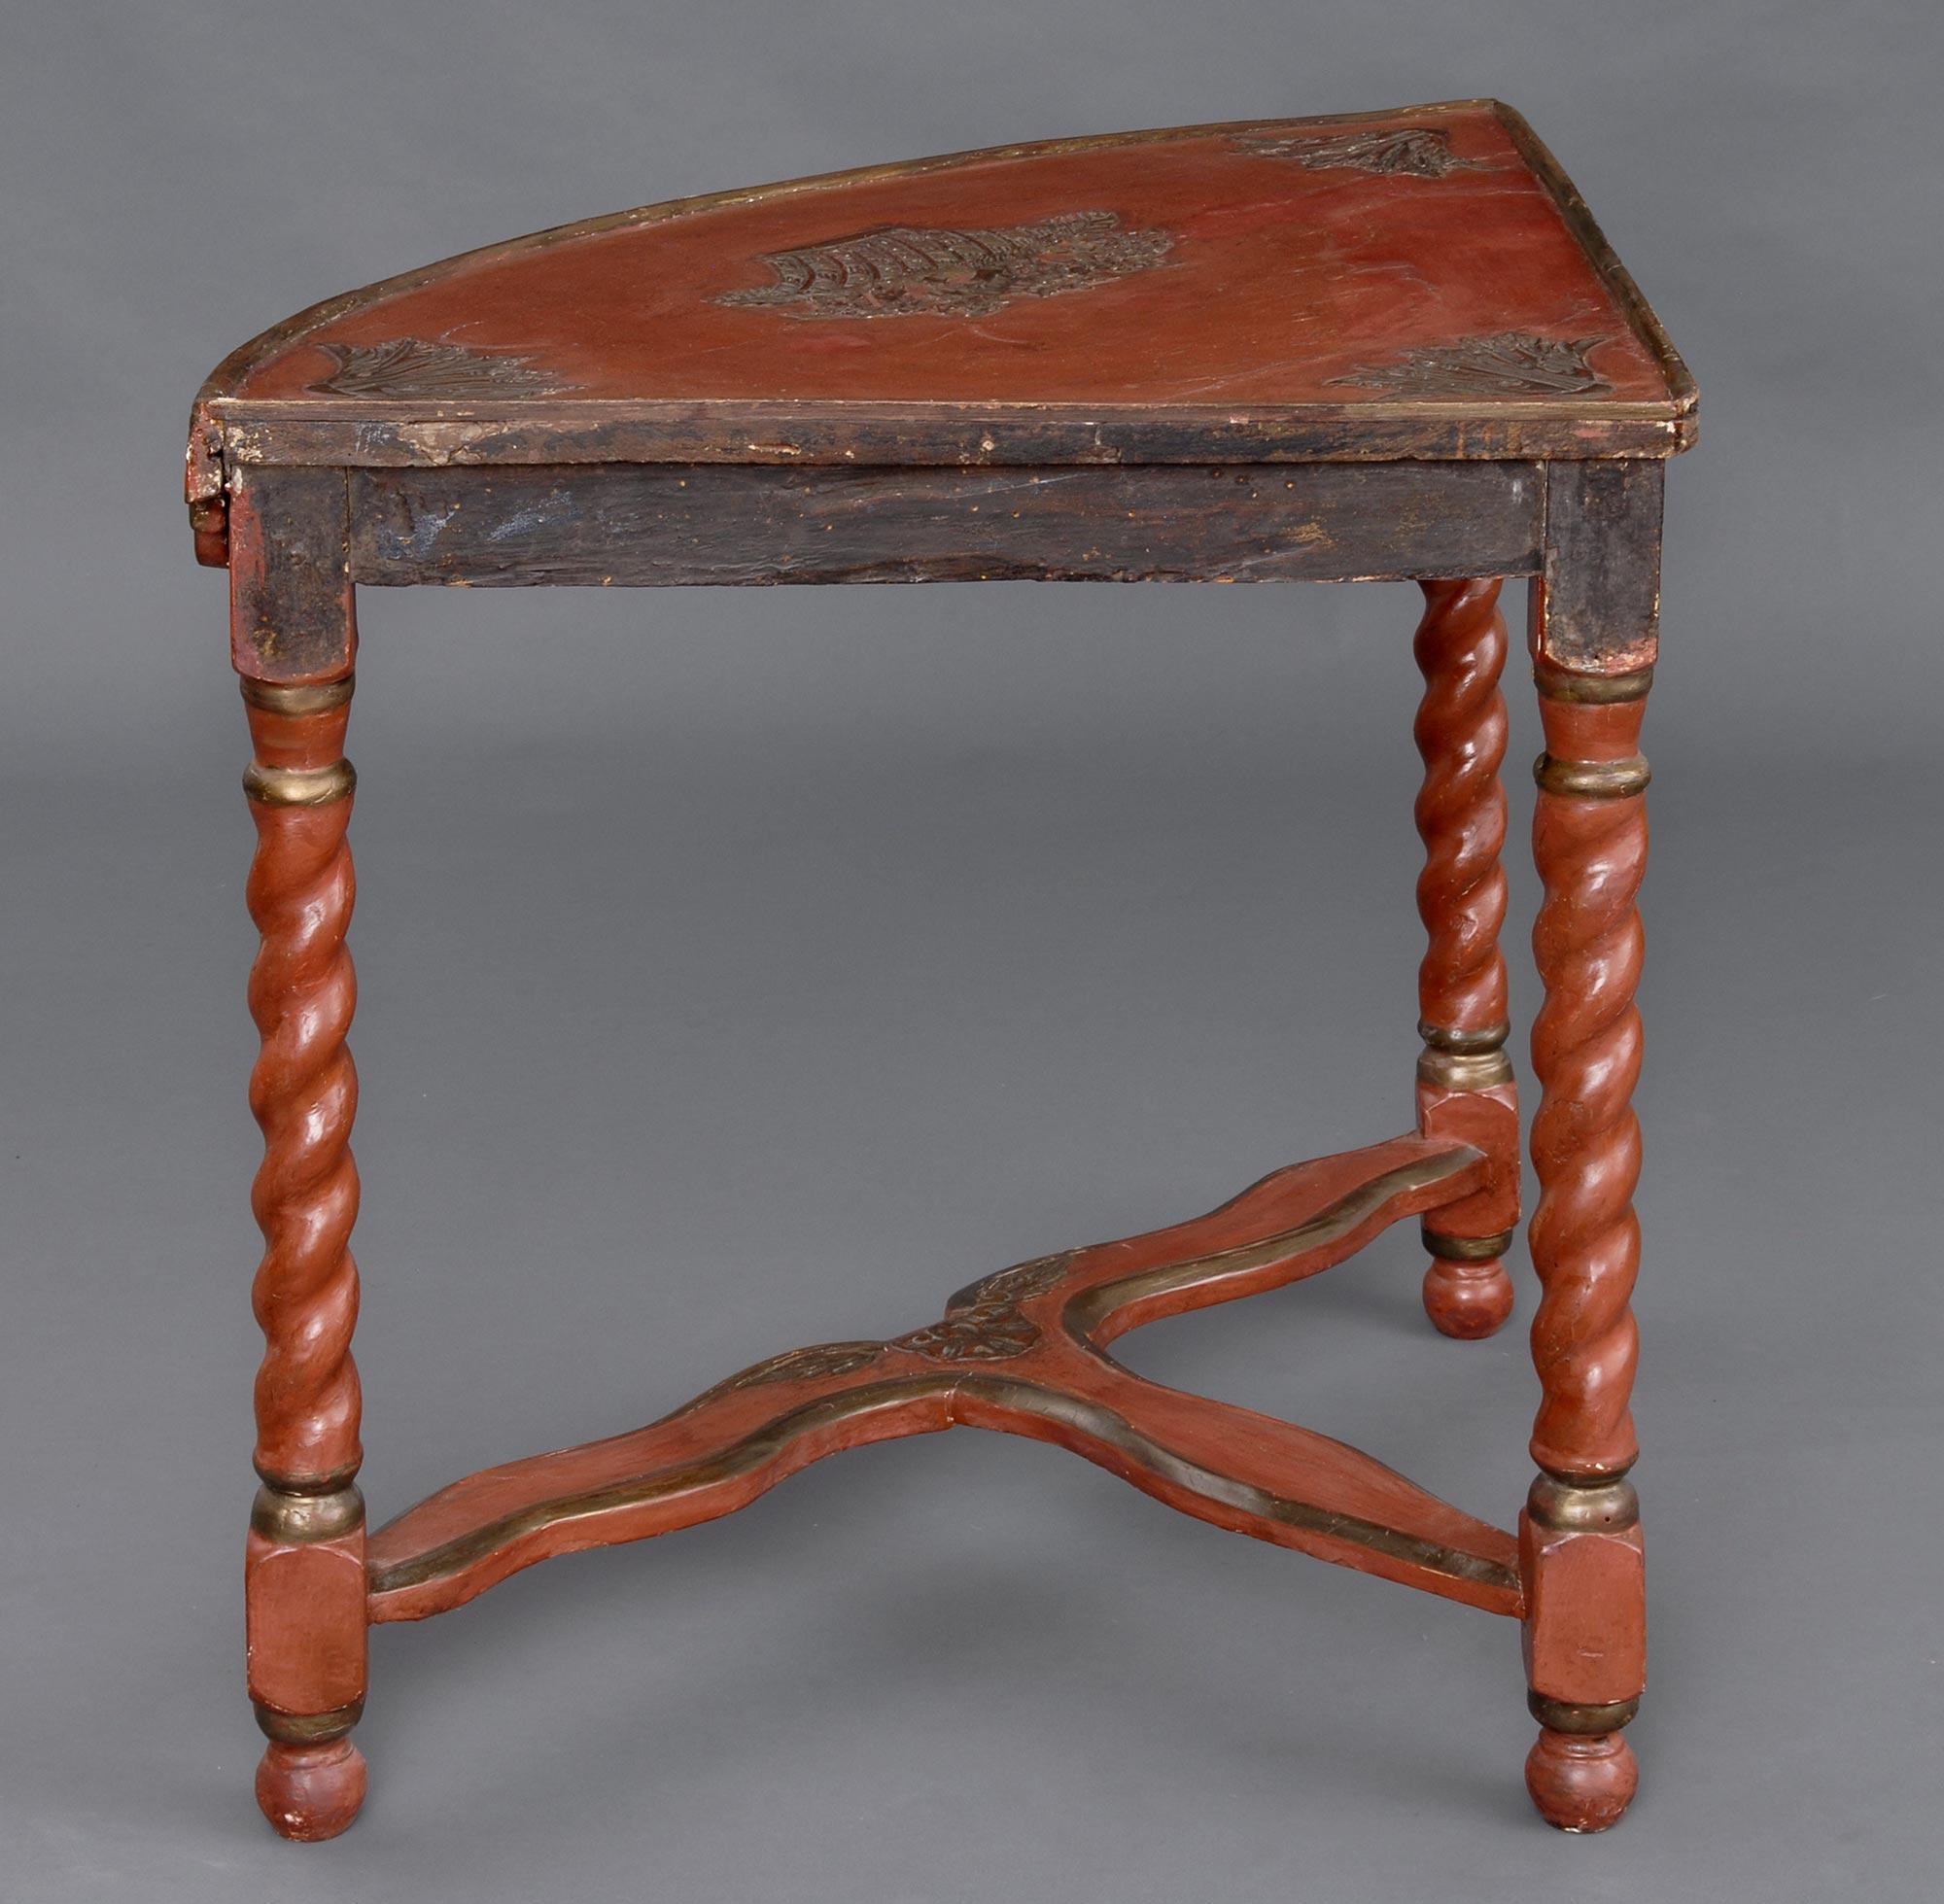 French Lacquer Antique Corner Table Antique Corner Tables